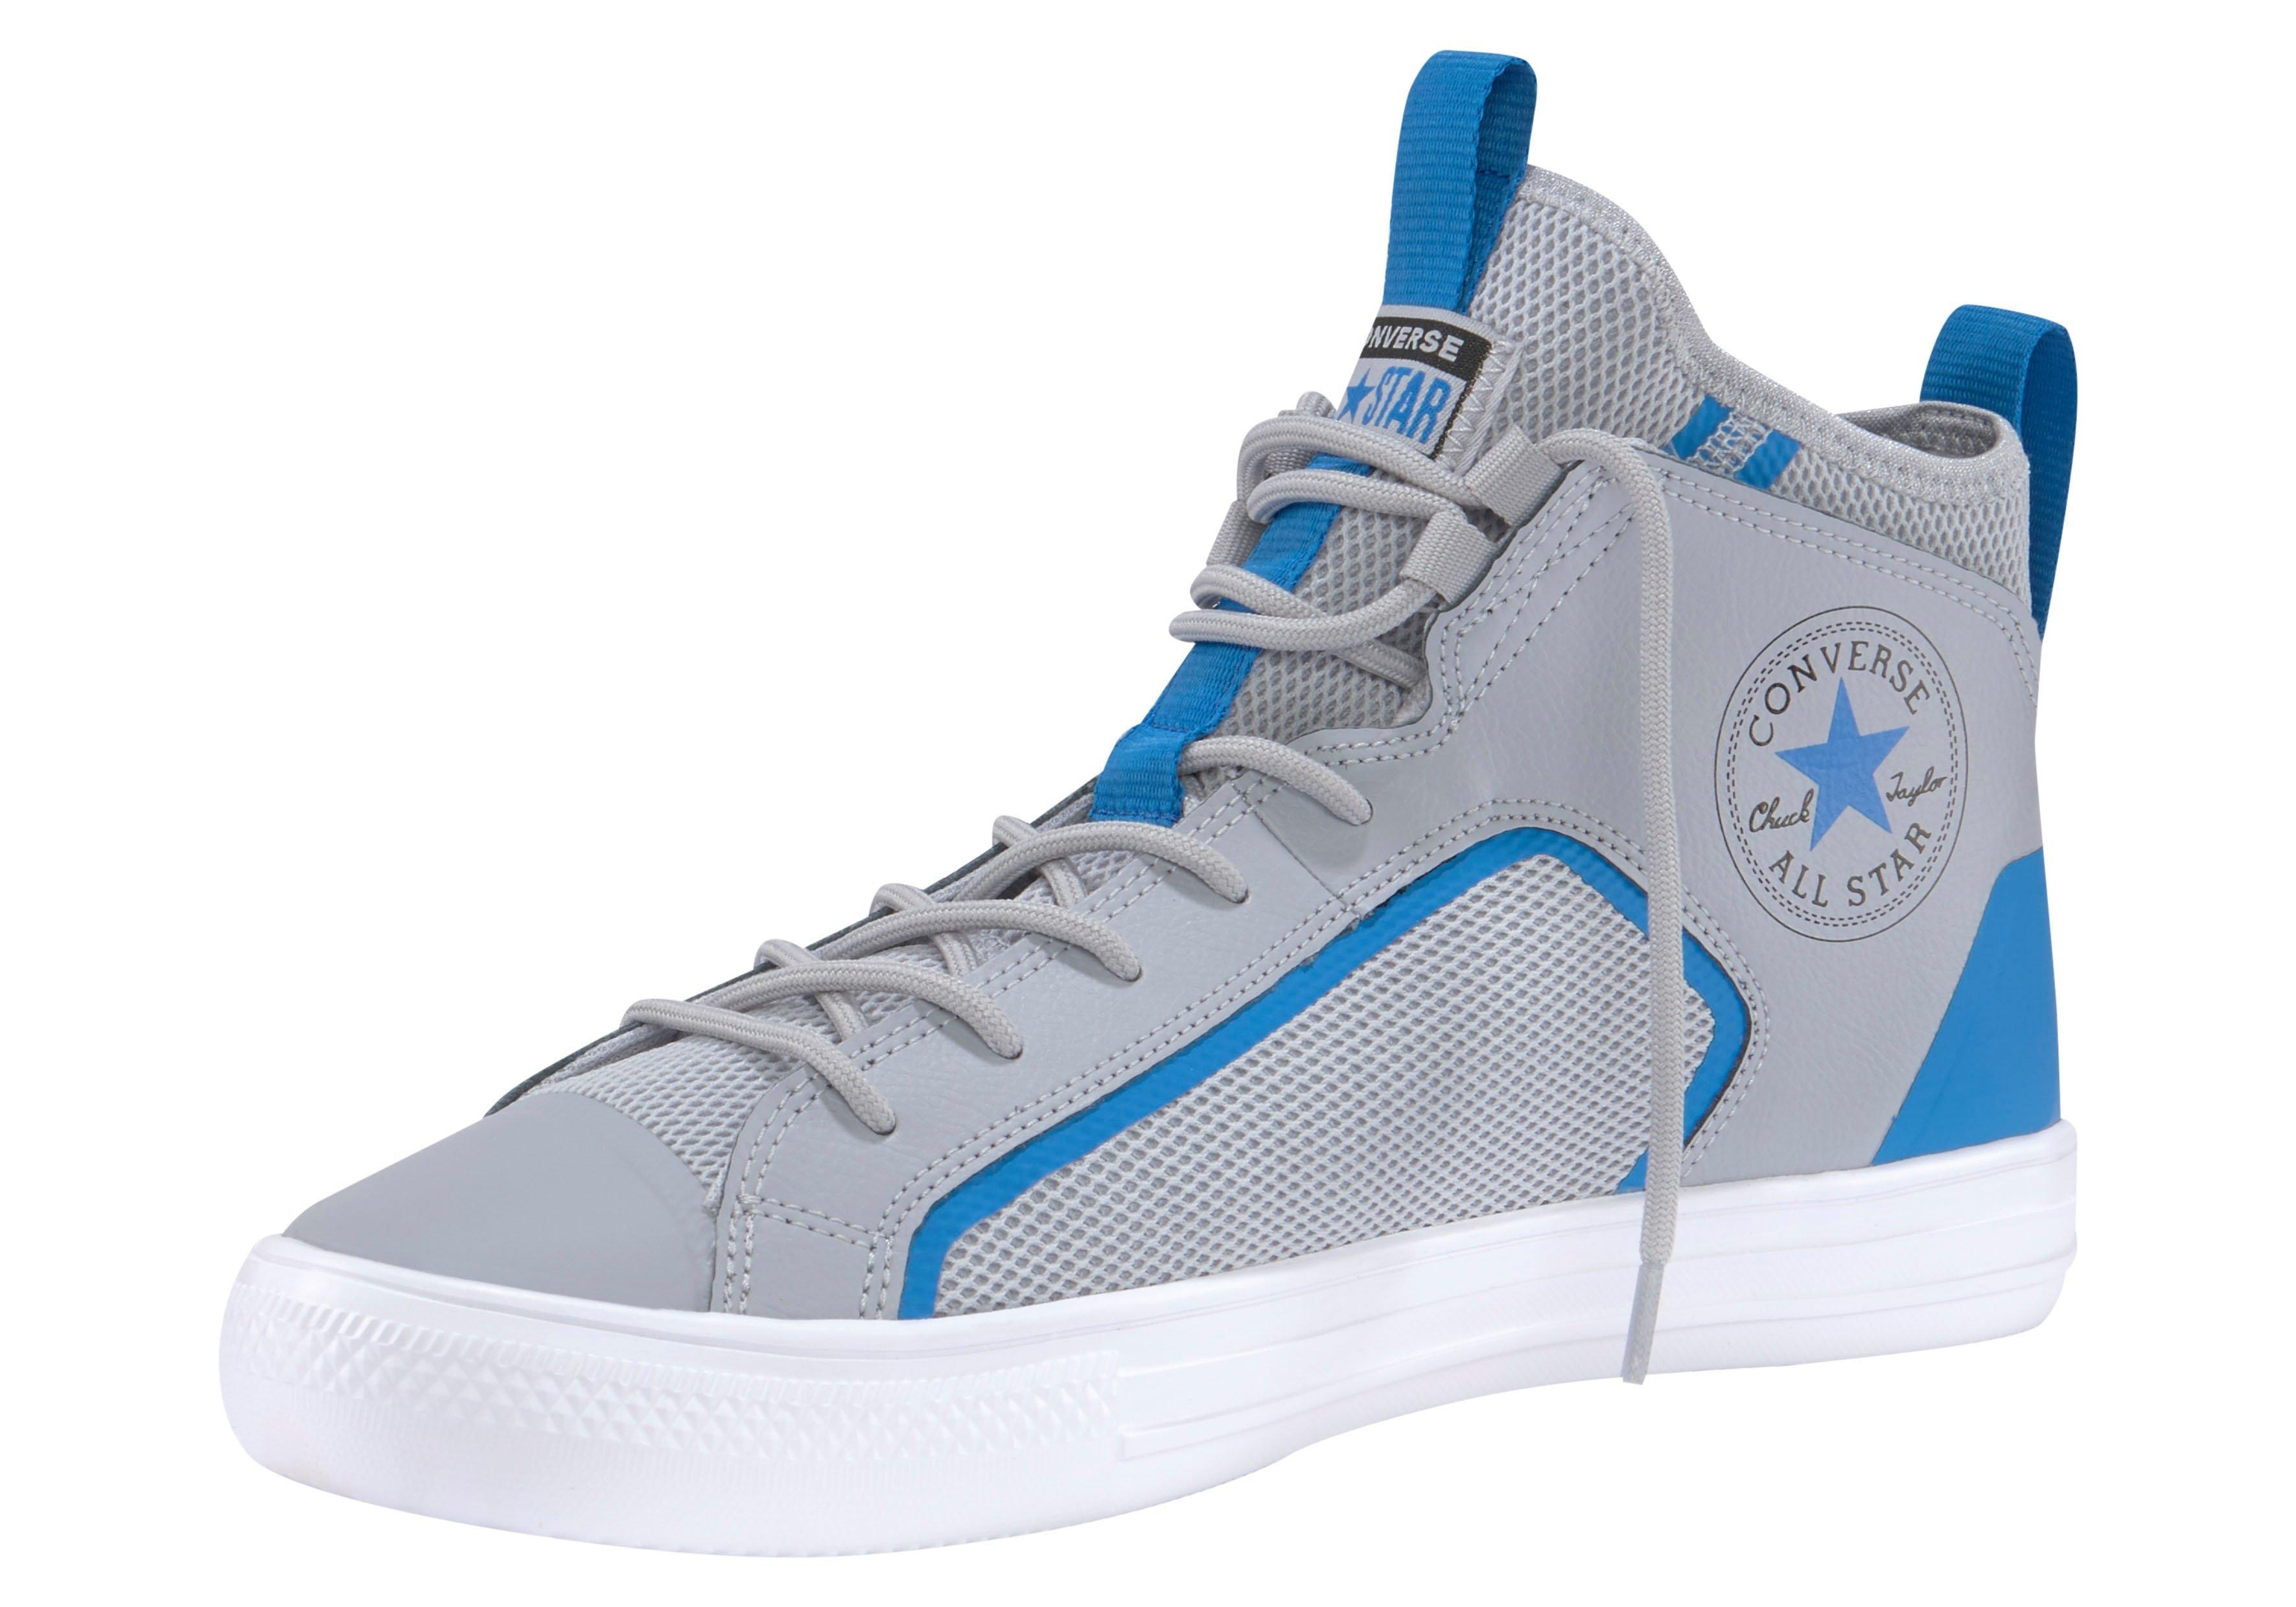 Converse sneakers »CHUCK TAYLOR ALL STAR ULTRA MID« - verschillende betaalmethodes